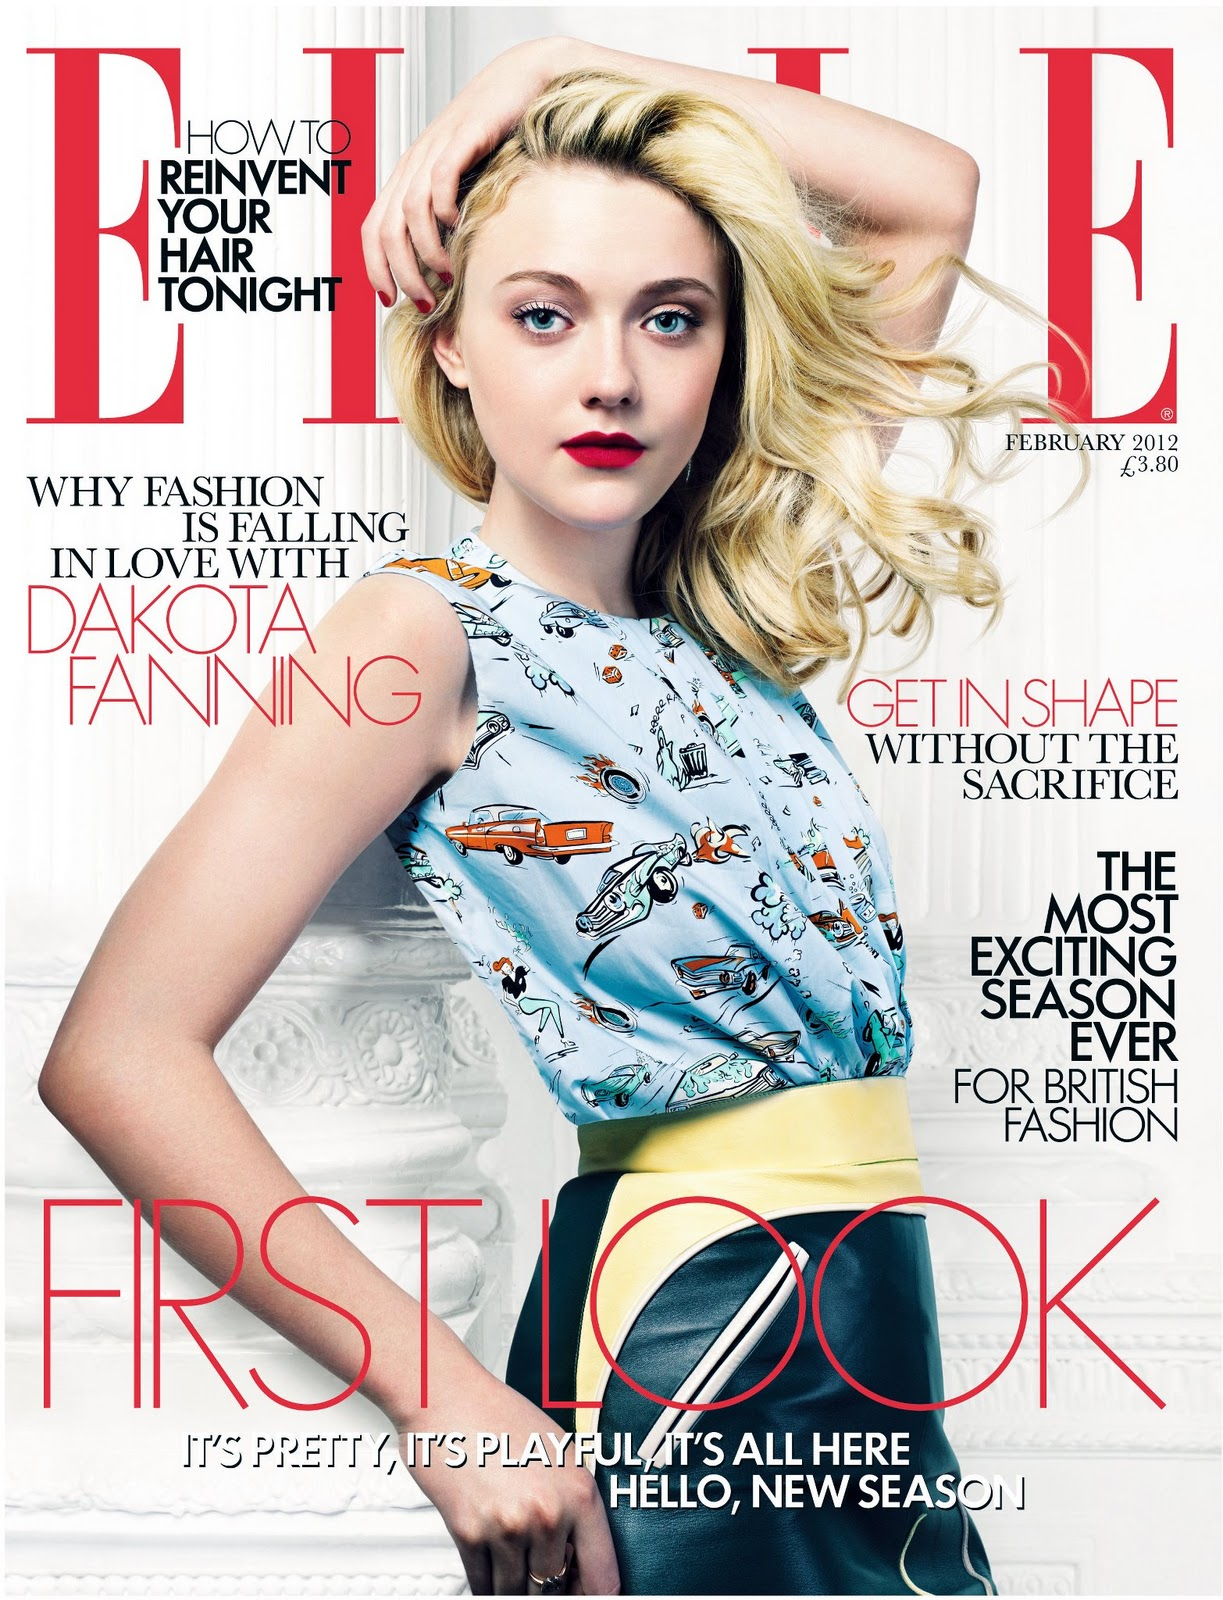 http://1.bp.blogspot.com/-1nX9DNg0FjI/Tww7zzYe5II/AAAAAAAAULI/QZgBGf4W1TE/s1600/Elle-UK-February-2012-Dakota-Fanning-Cover.jpg